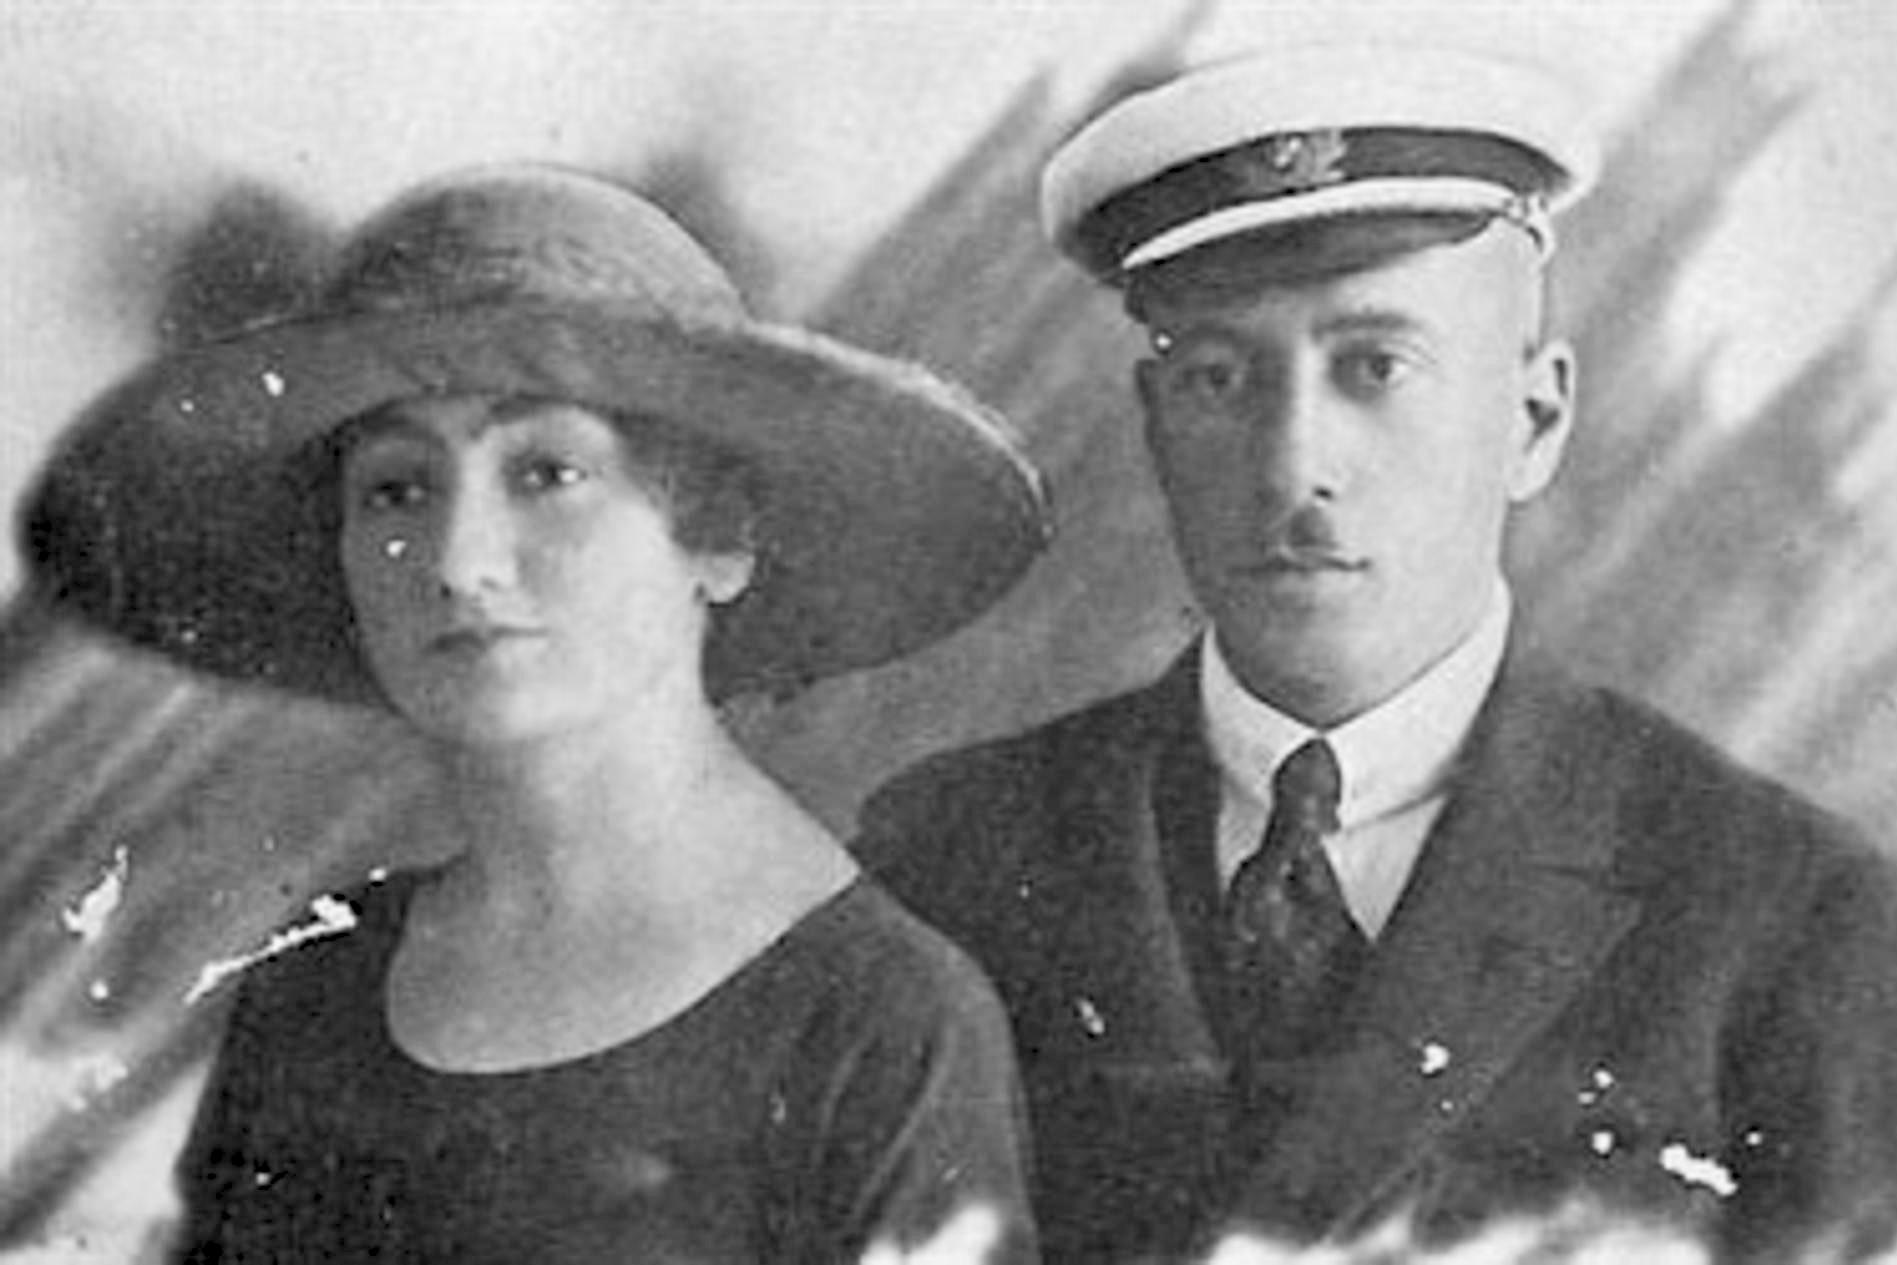 Ceclava Czapska and Nicolas Dolgoruky in 1919 / Legion Media